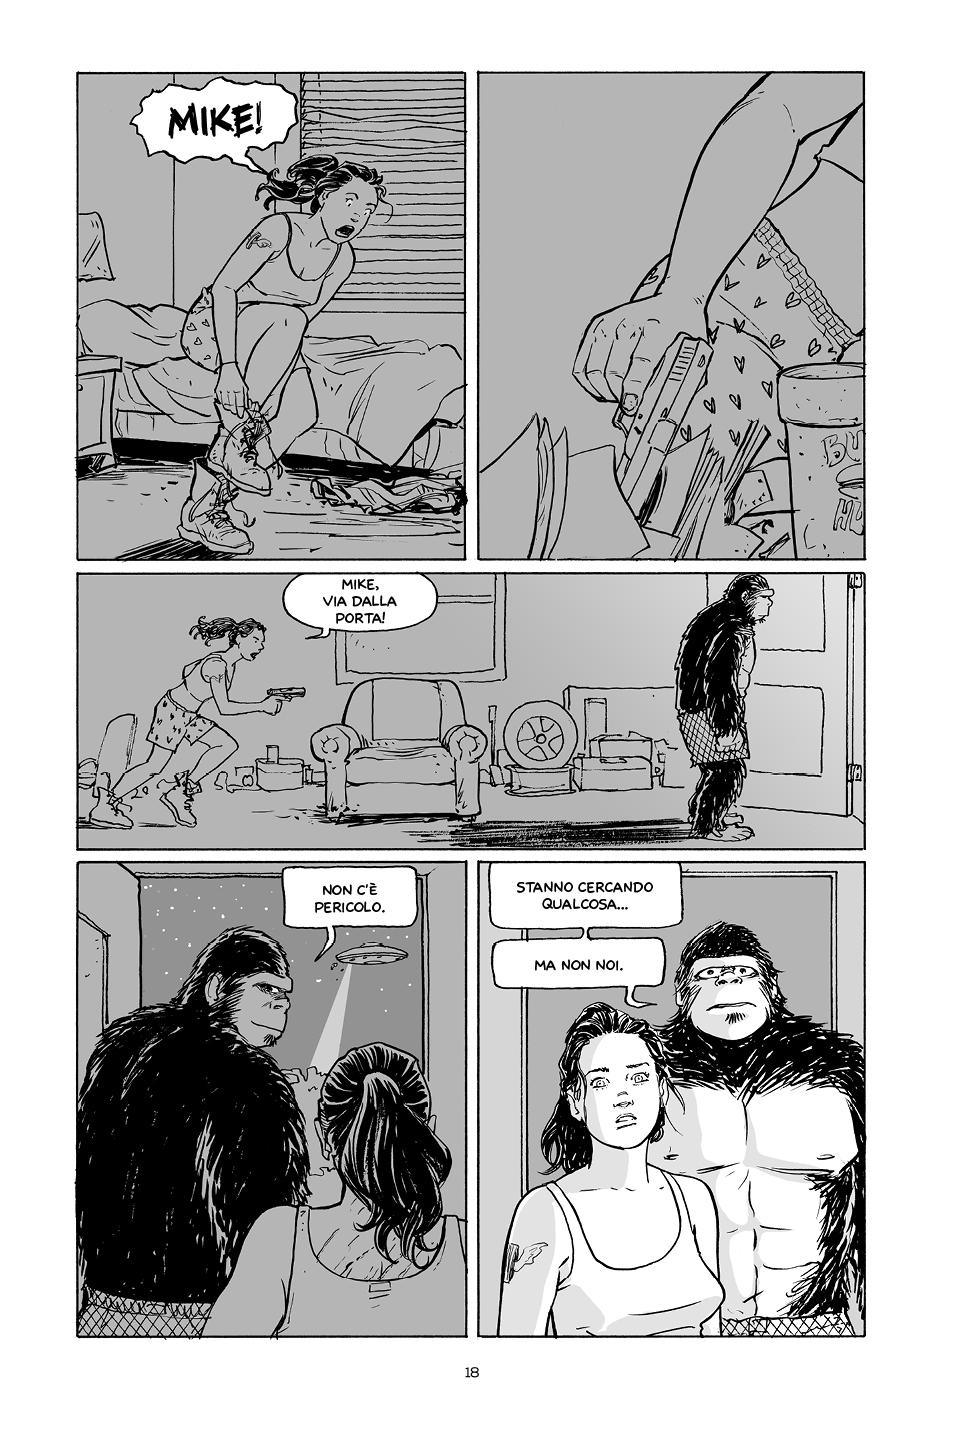 Motorgirl, pagina 18